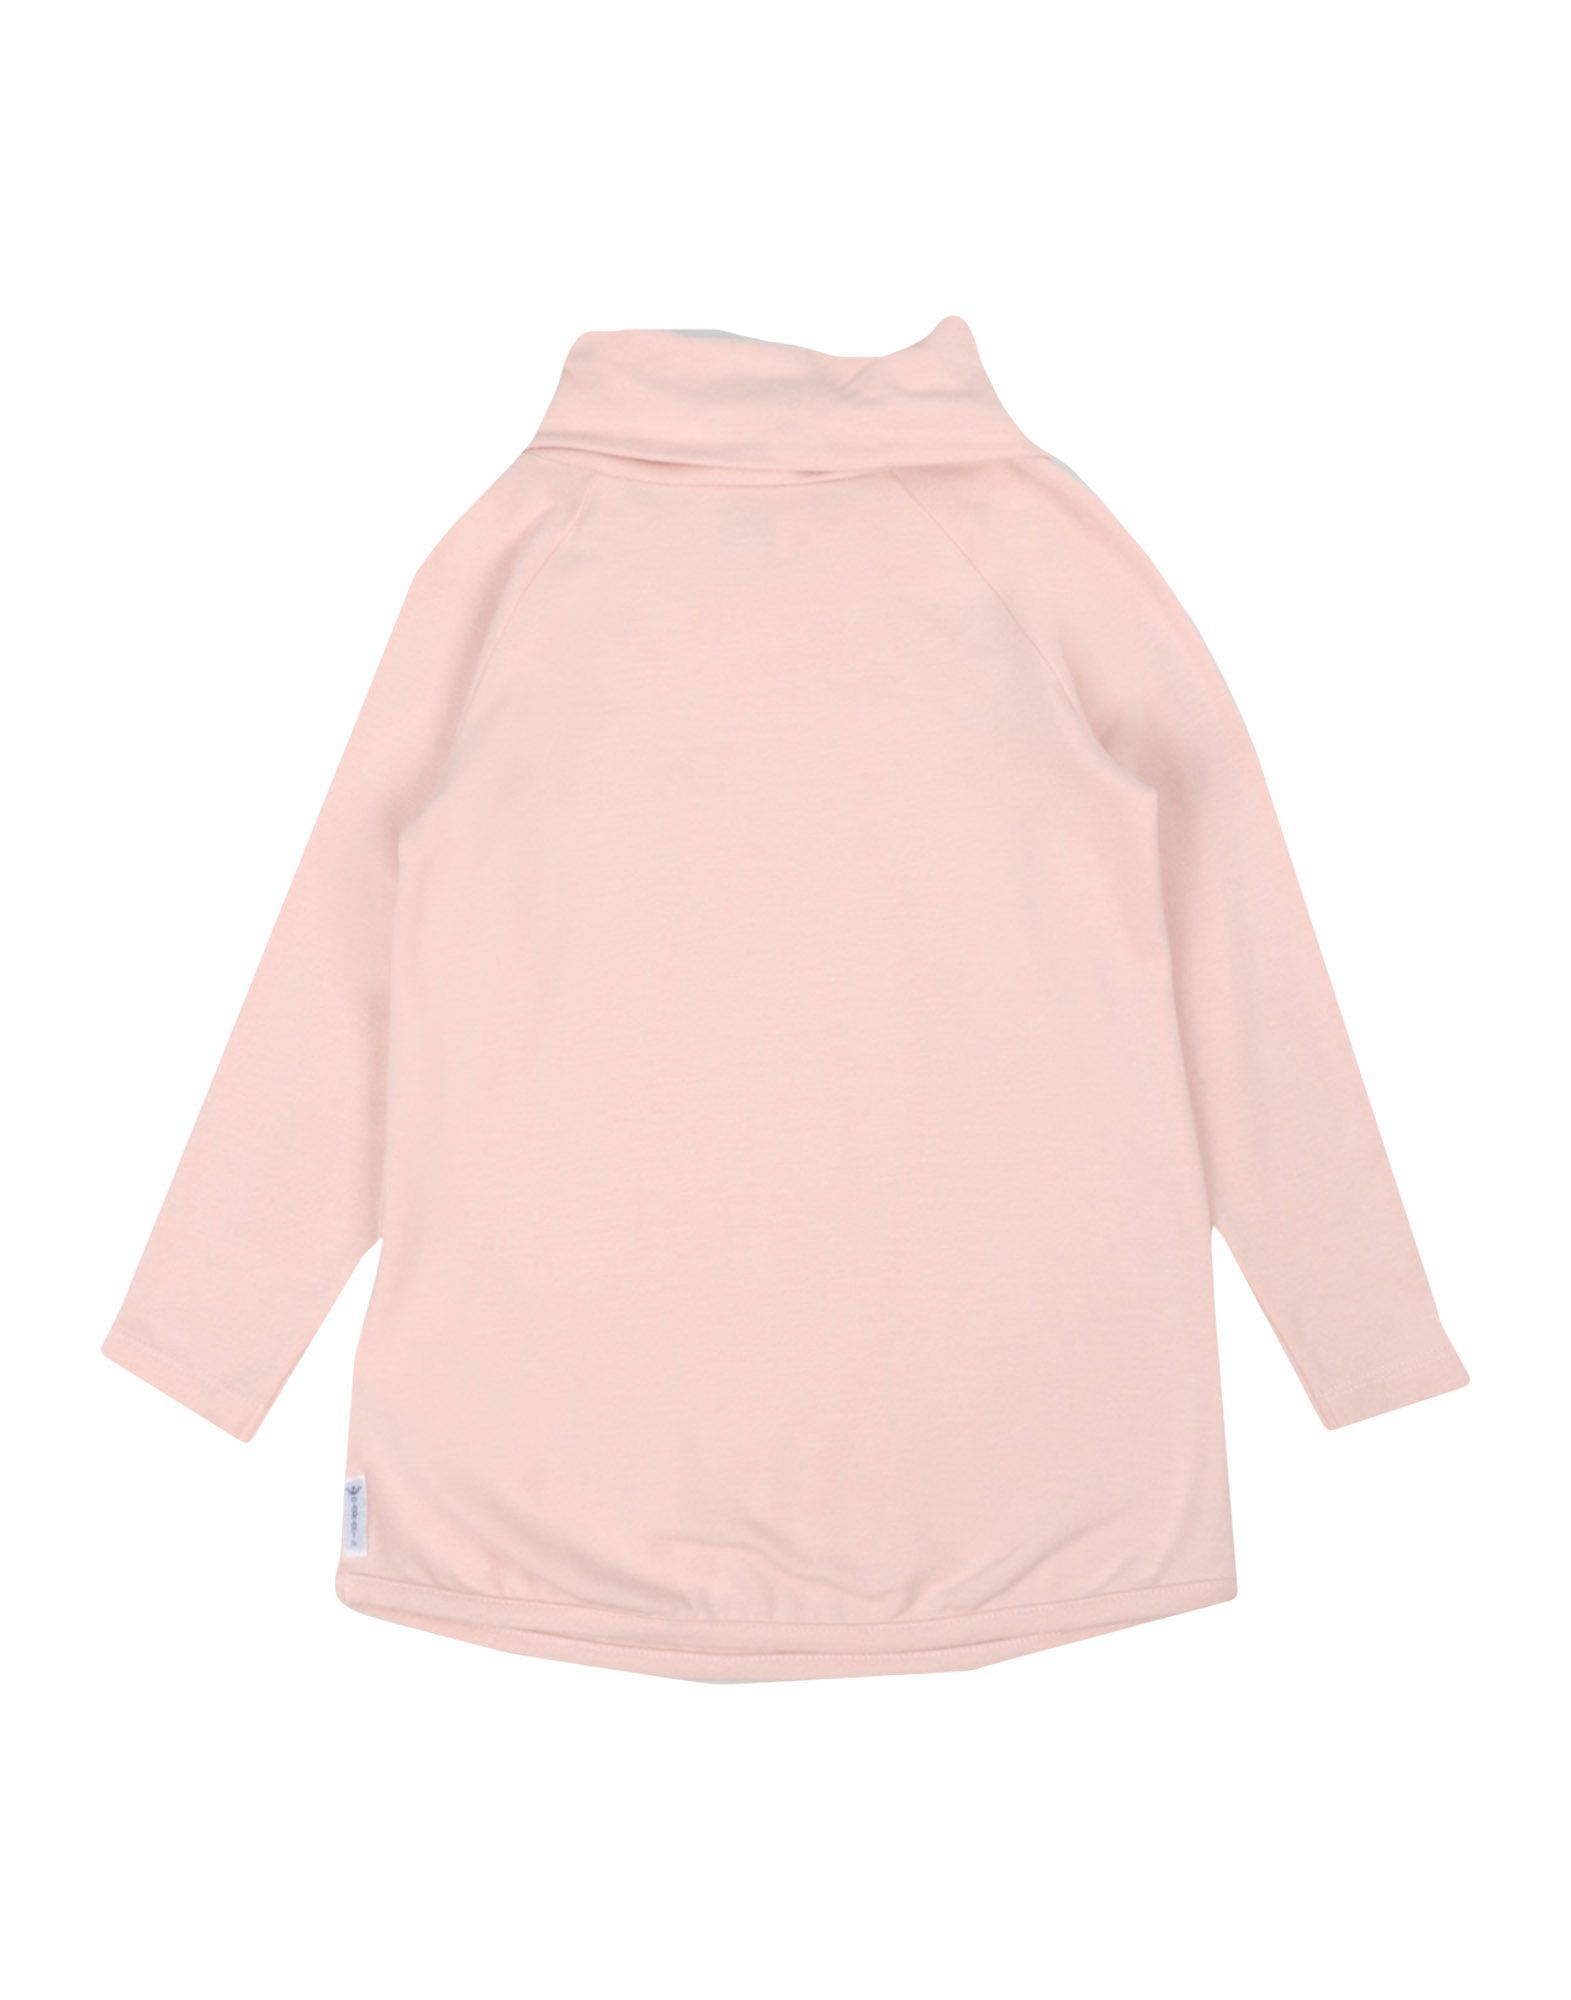 Armani Junior Light Pink Girls Top